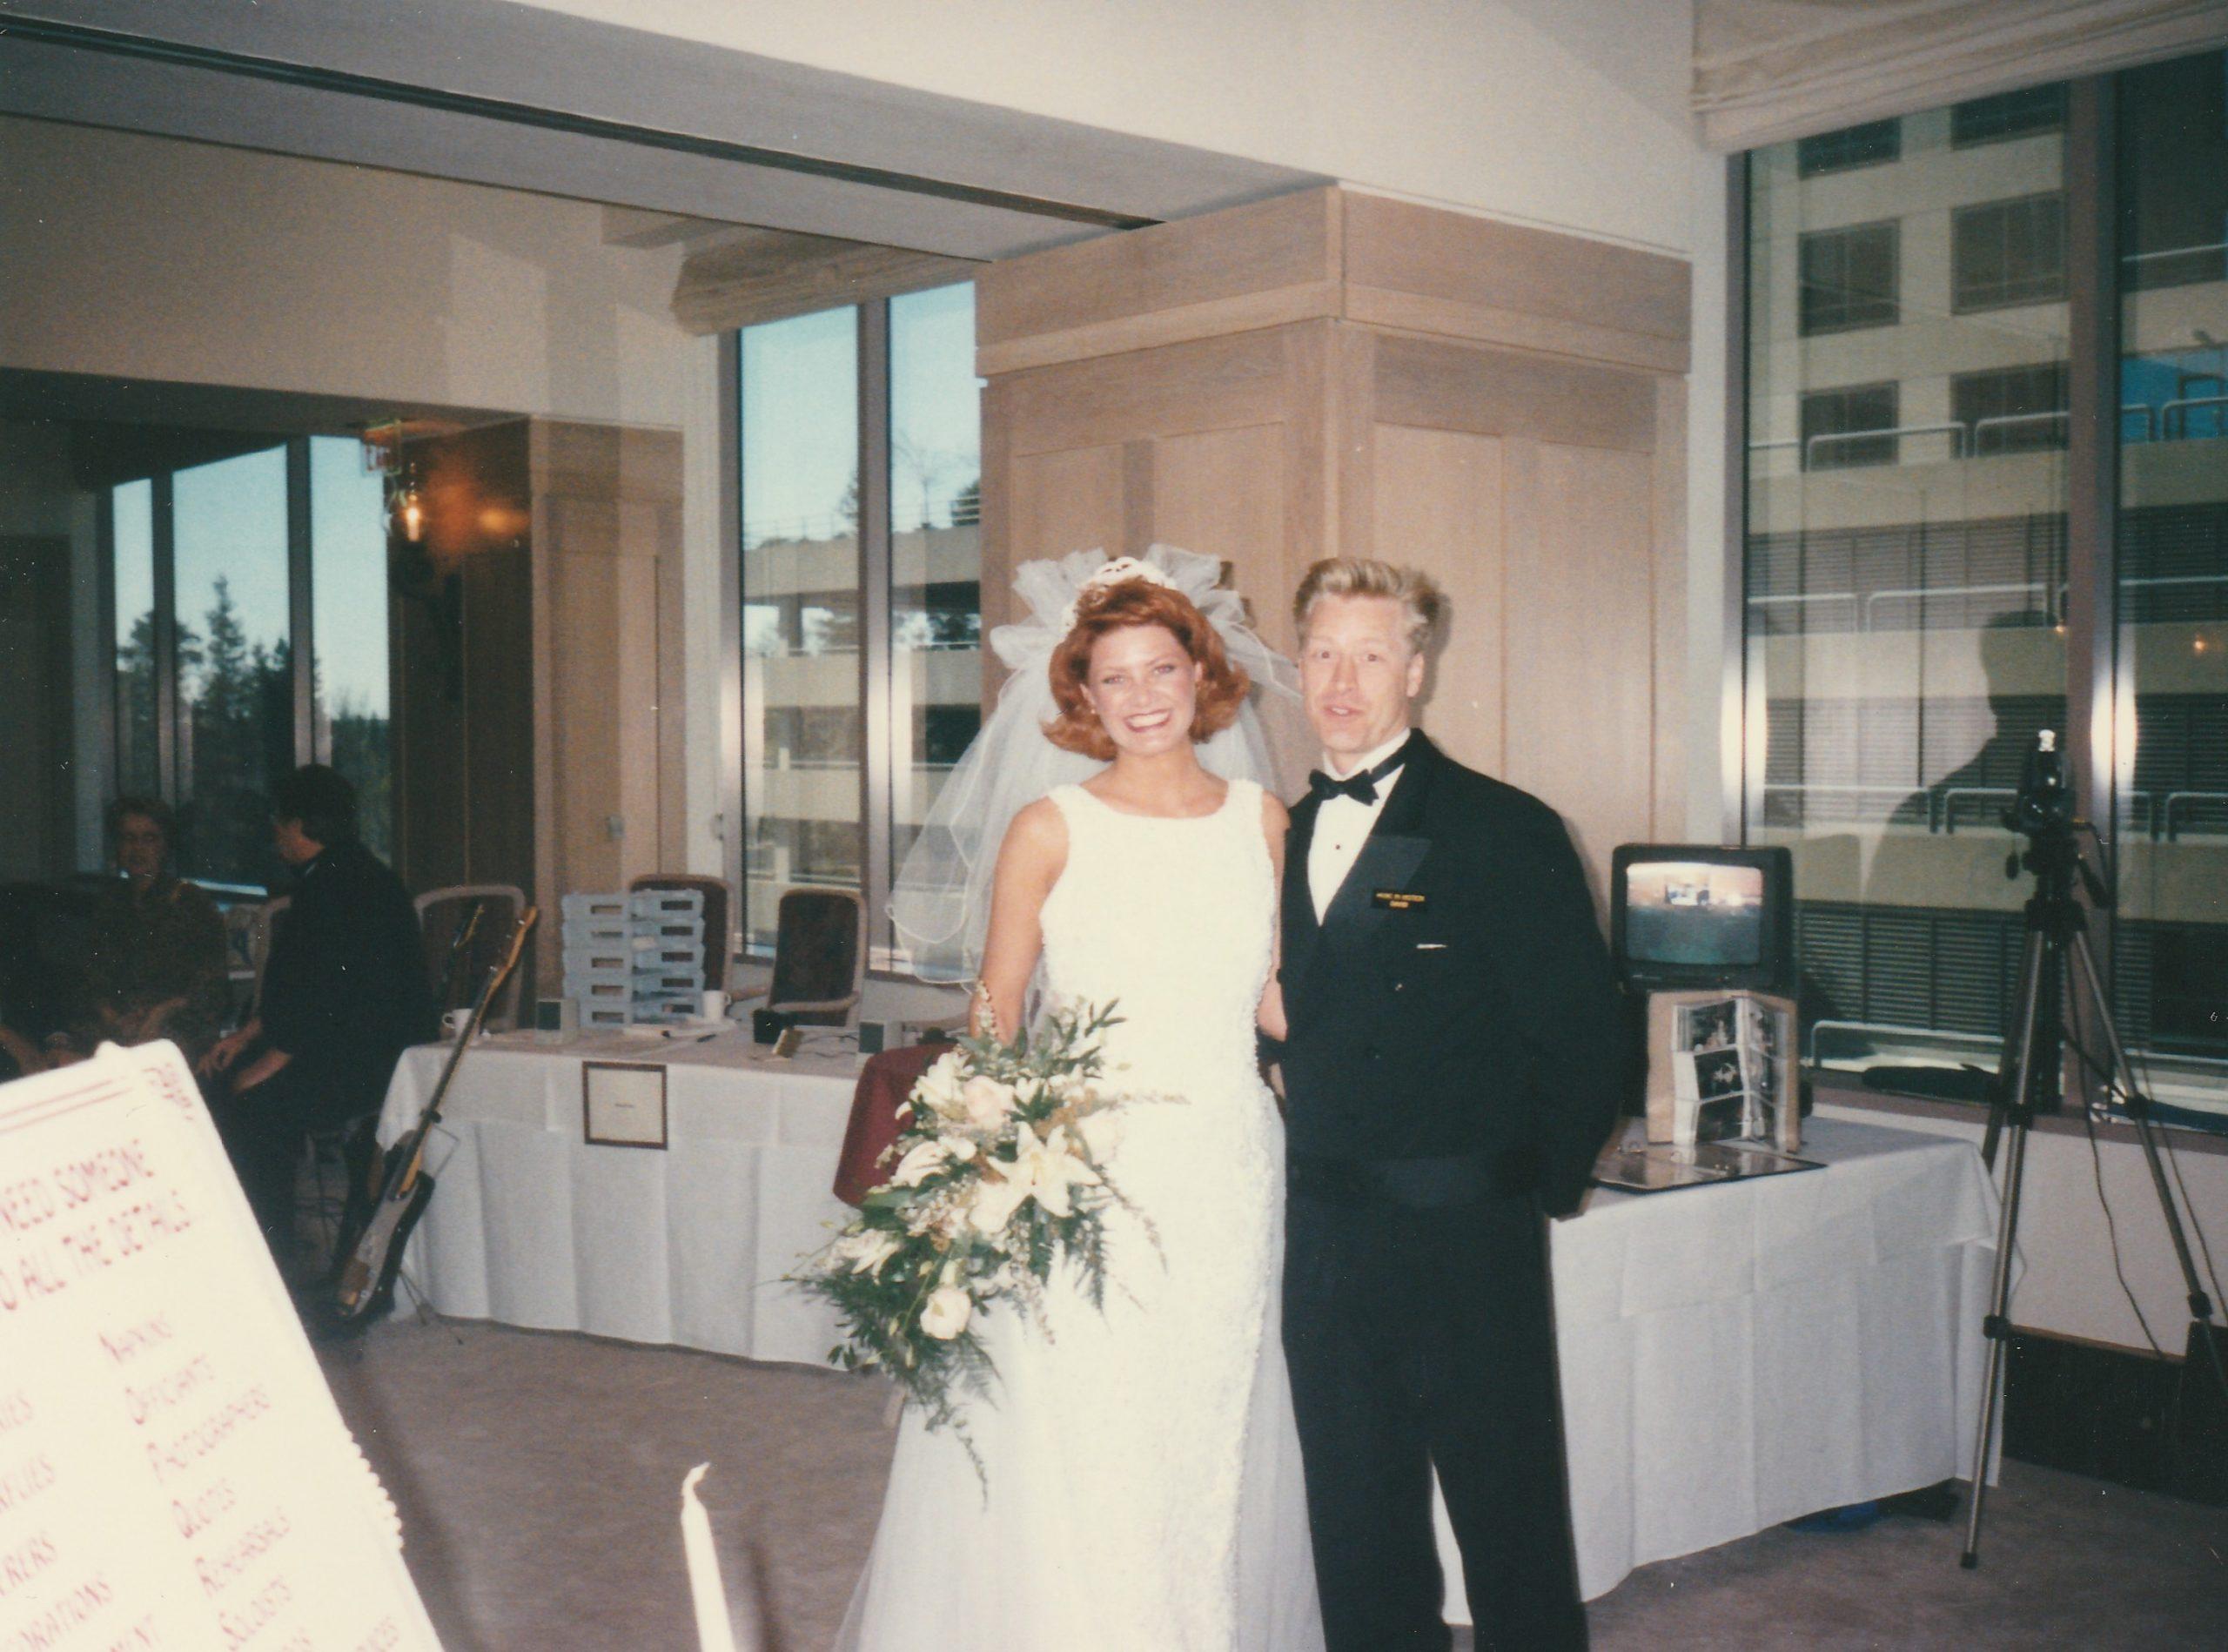 Capitol Club bridal event in Wells Fargo building